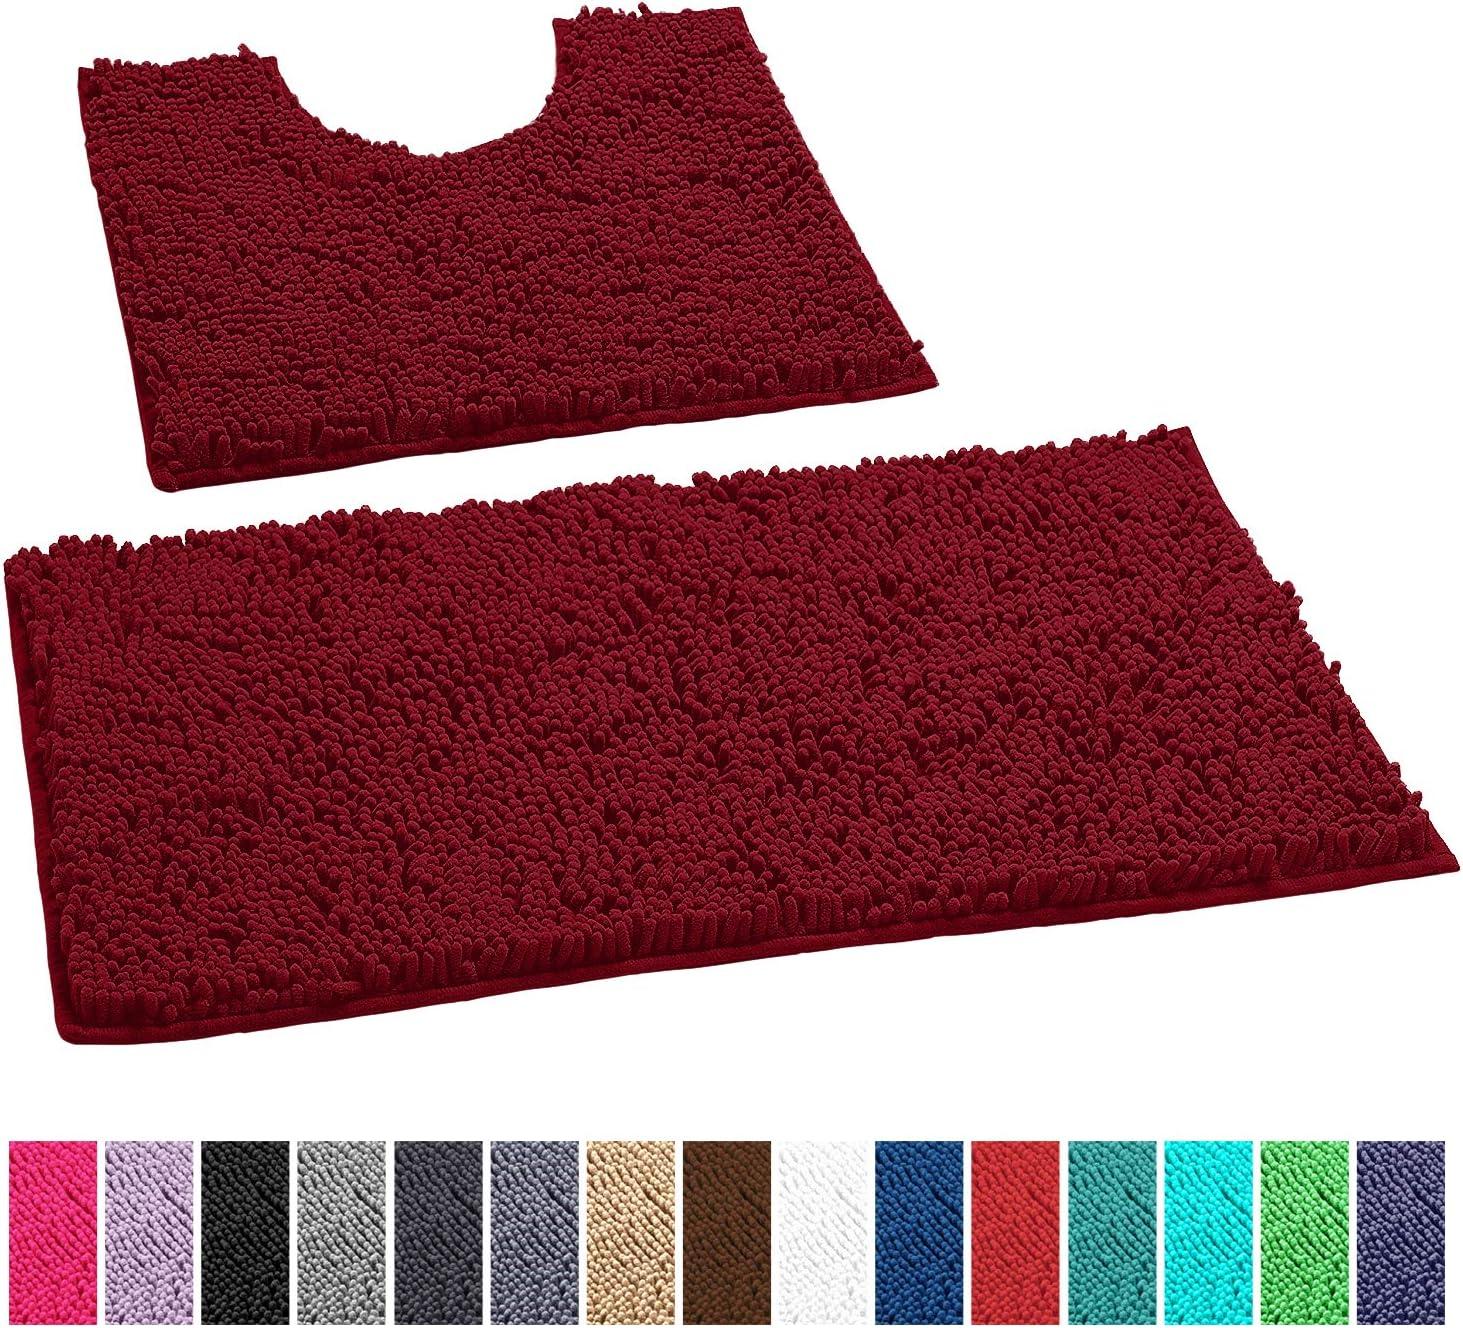 LuxUrux Bathroom Rugs Luxury Chenille 2-Piece Bath Mat Set, Soft Plush Anti-Slip Shower Rug +Toilet Mat.1'' Microfiber Shaggy Carpet, Super Absorbent Machine Washable Bath Mats(Curved Set, Maroon-Red)